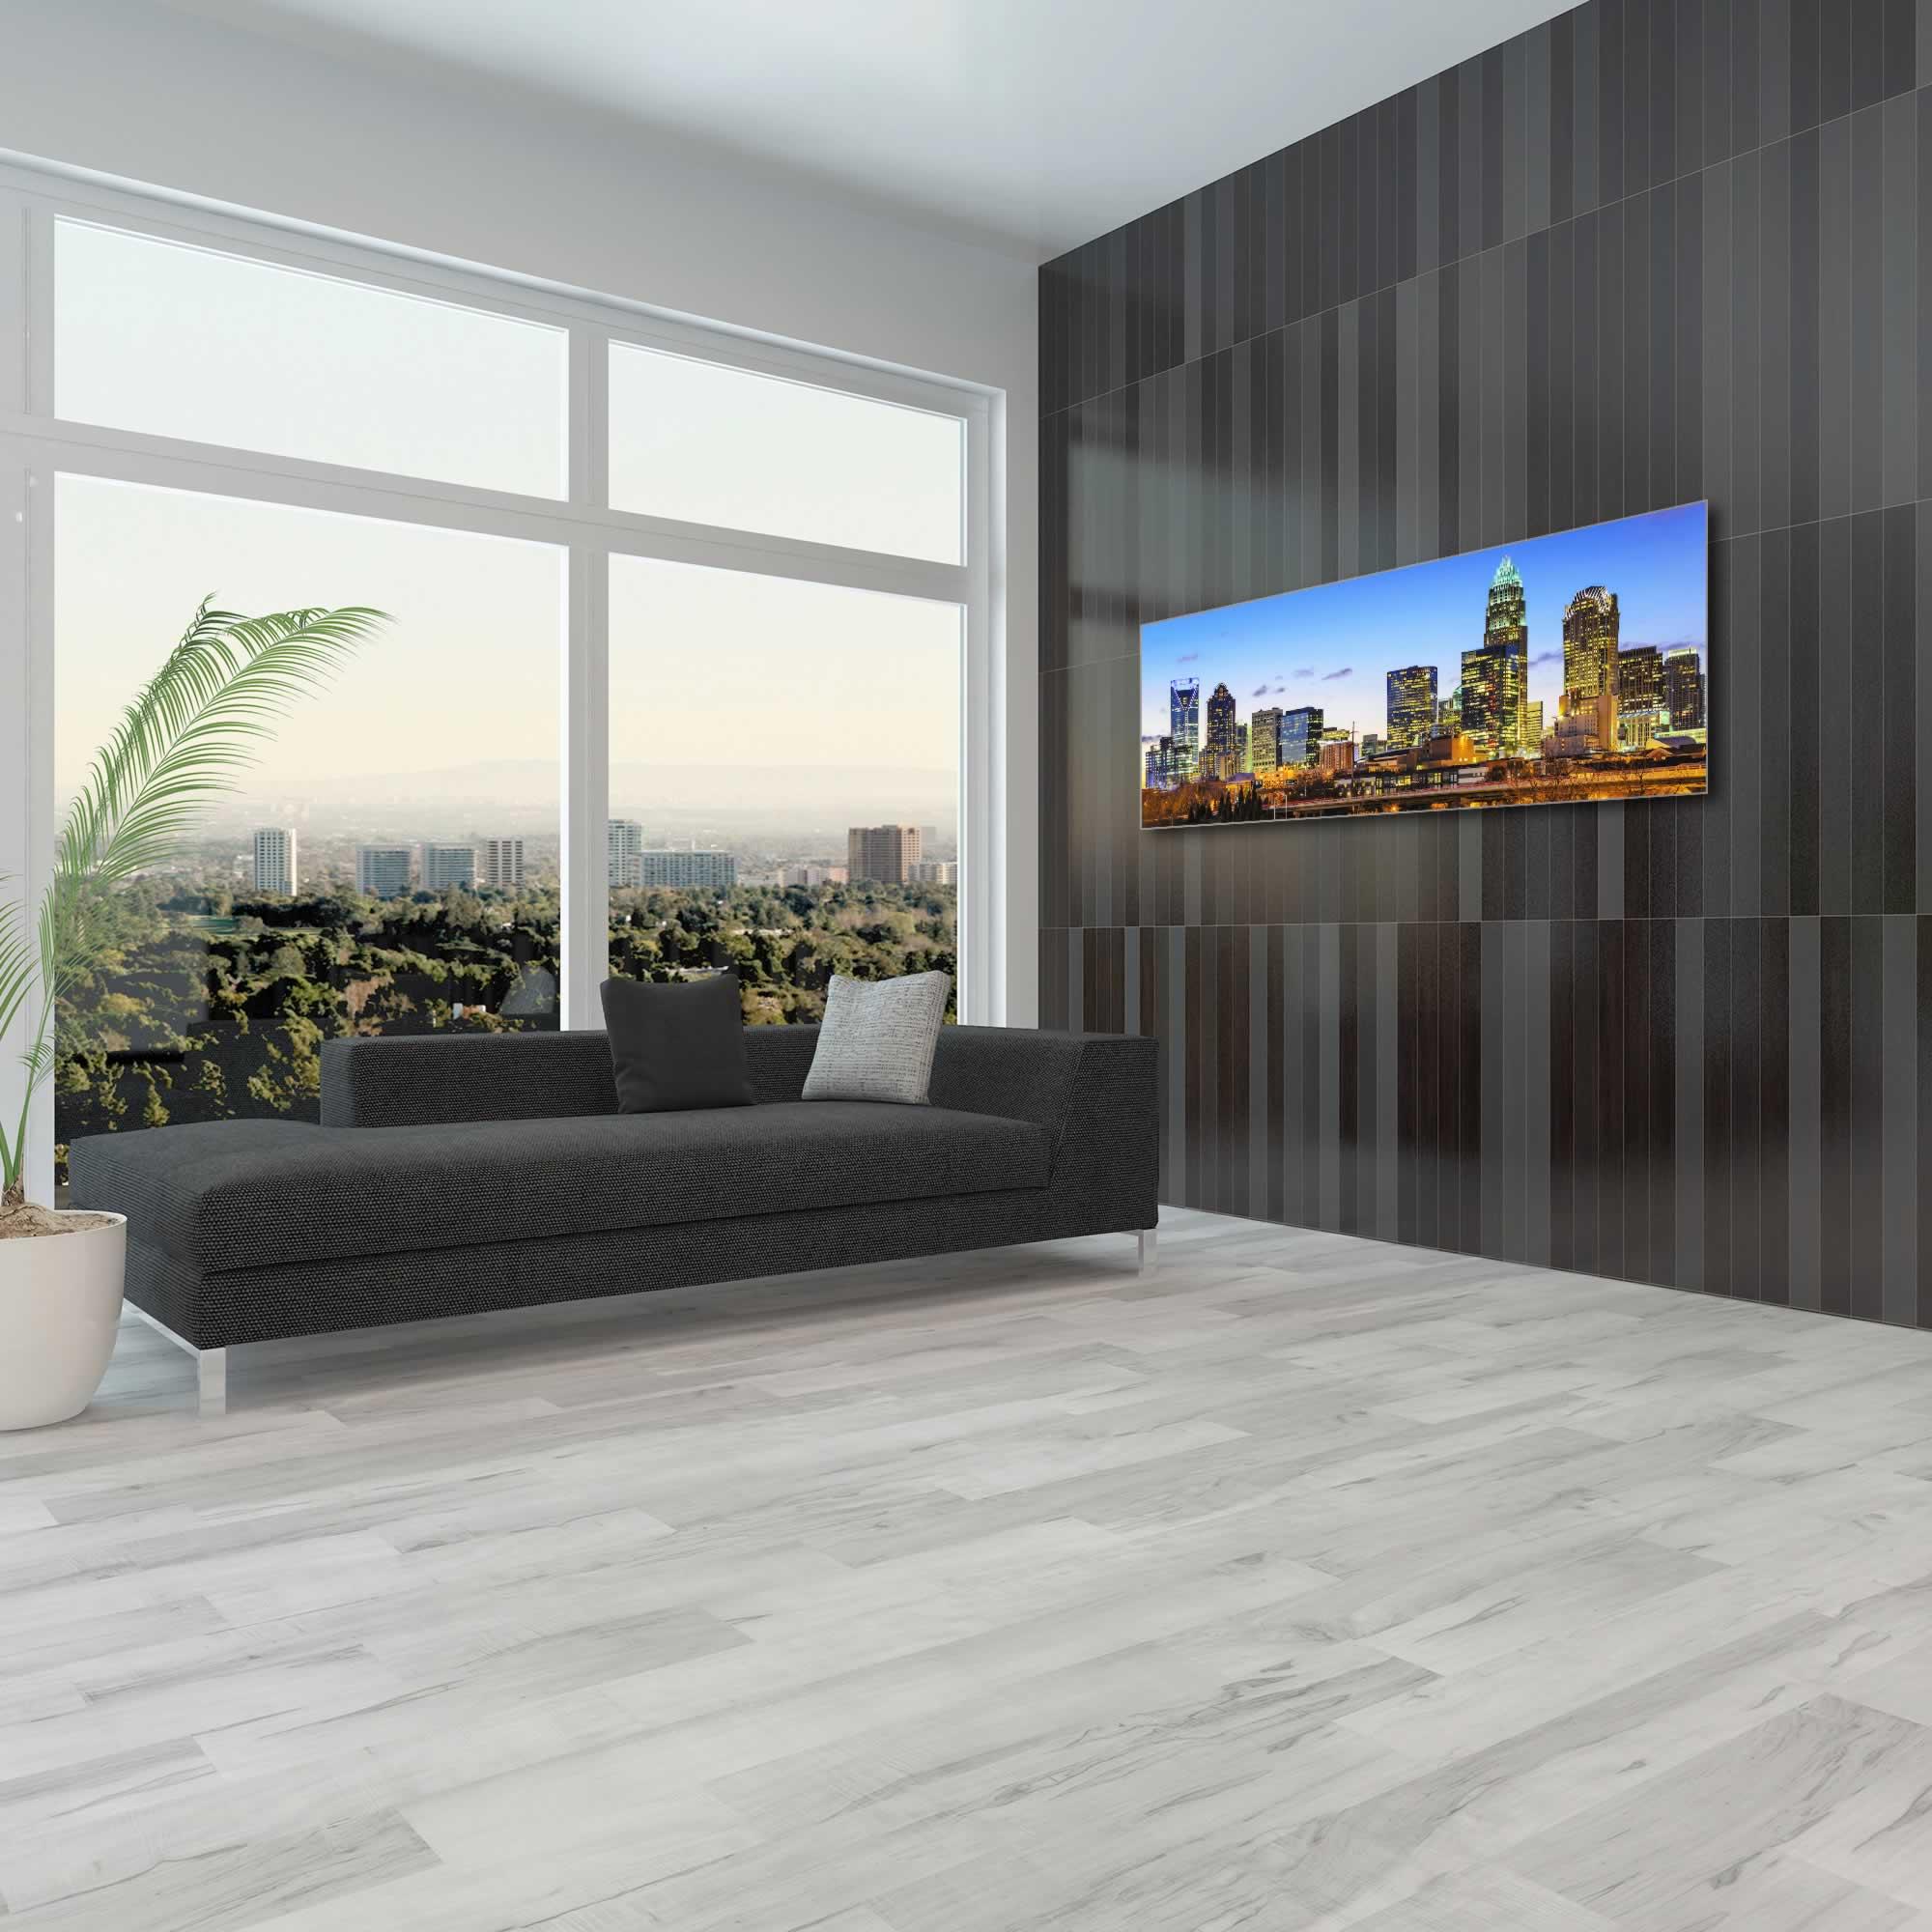 Charlotte City Skyline - Urban Modern Art, Designer Home Decor, Cityscape Wall Artwork, Trendy Contemporary Art - Alternate View 1